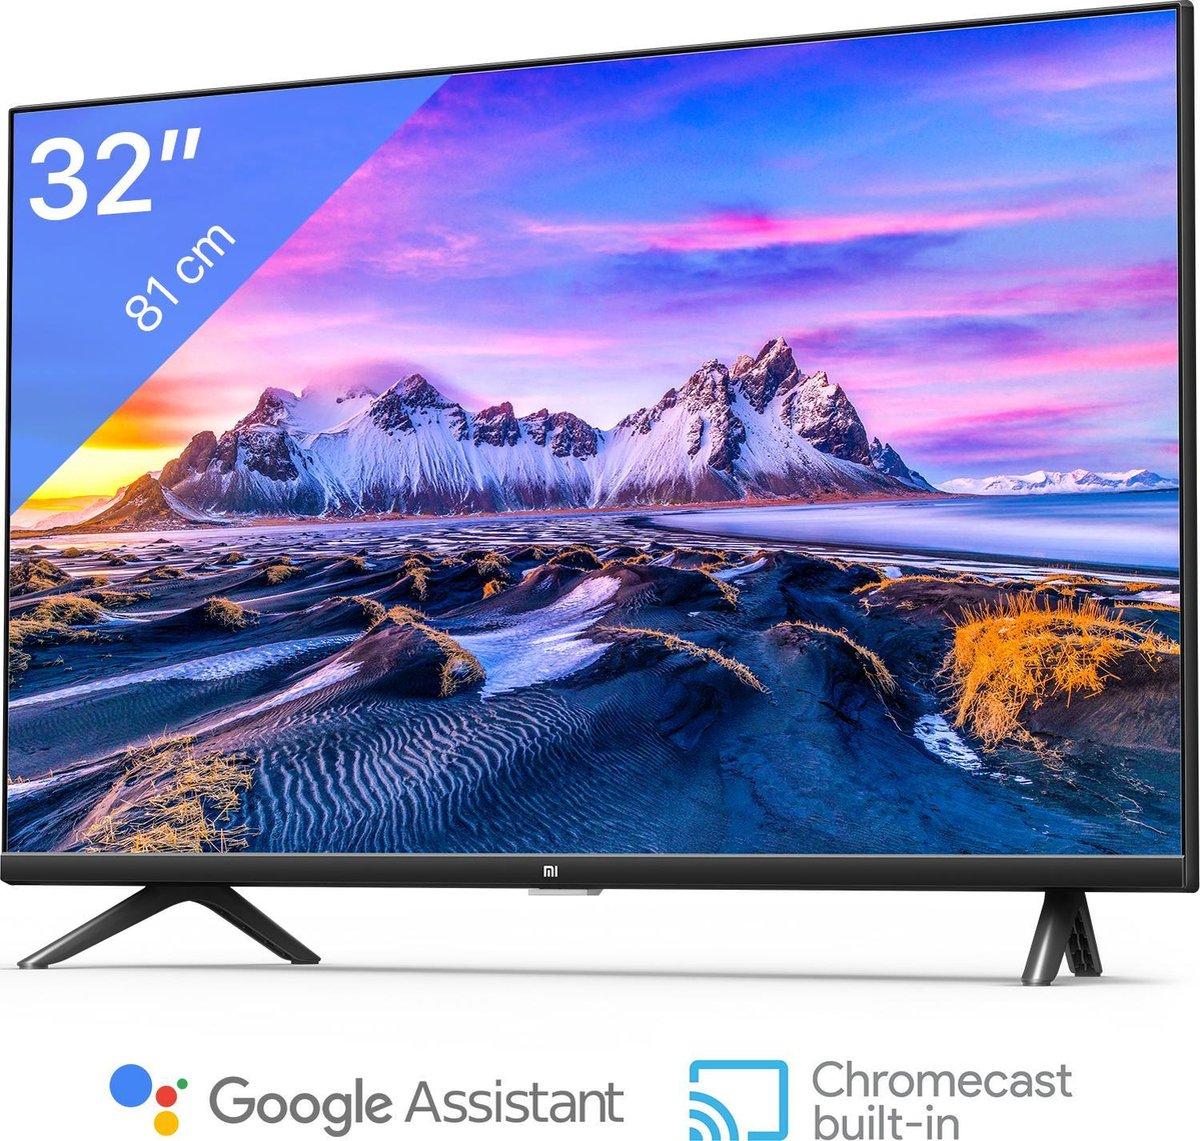 Xiaomi Mi Smart TV P1 – 32 inch – HD ready LED – 2021